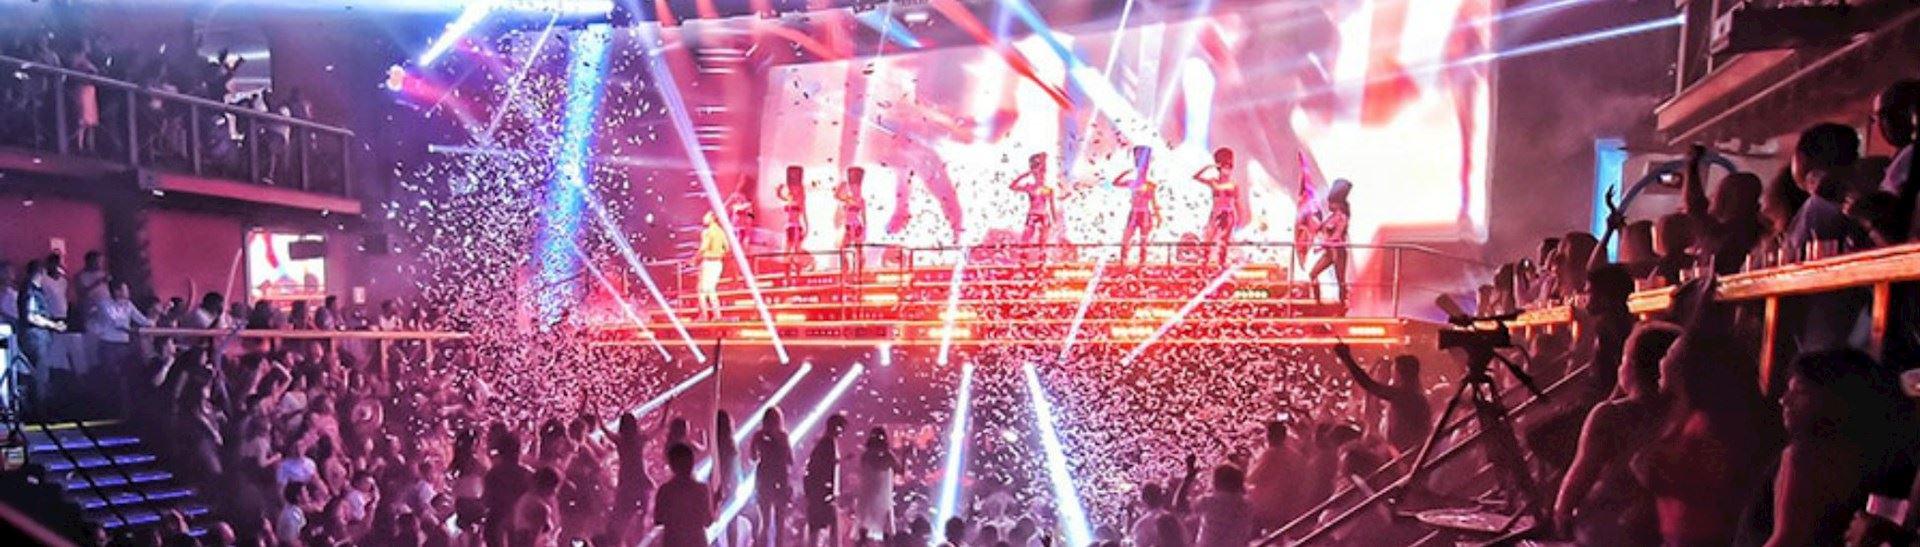 Amadeus Nightclub Aberdeen dominican republic holidays 2020 / 2021 - all inclusive deals